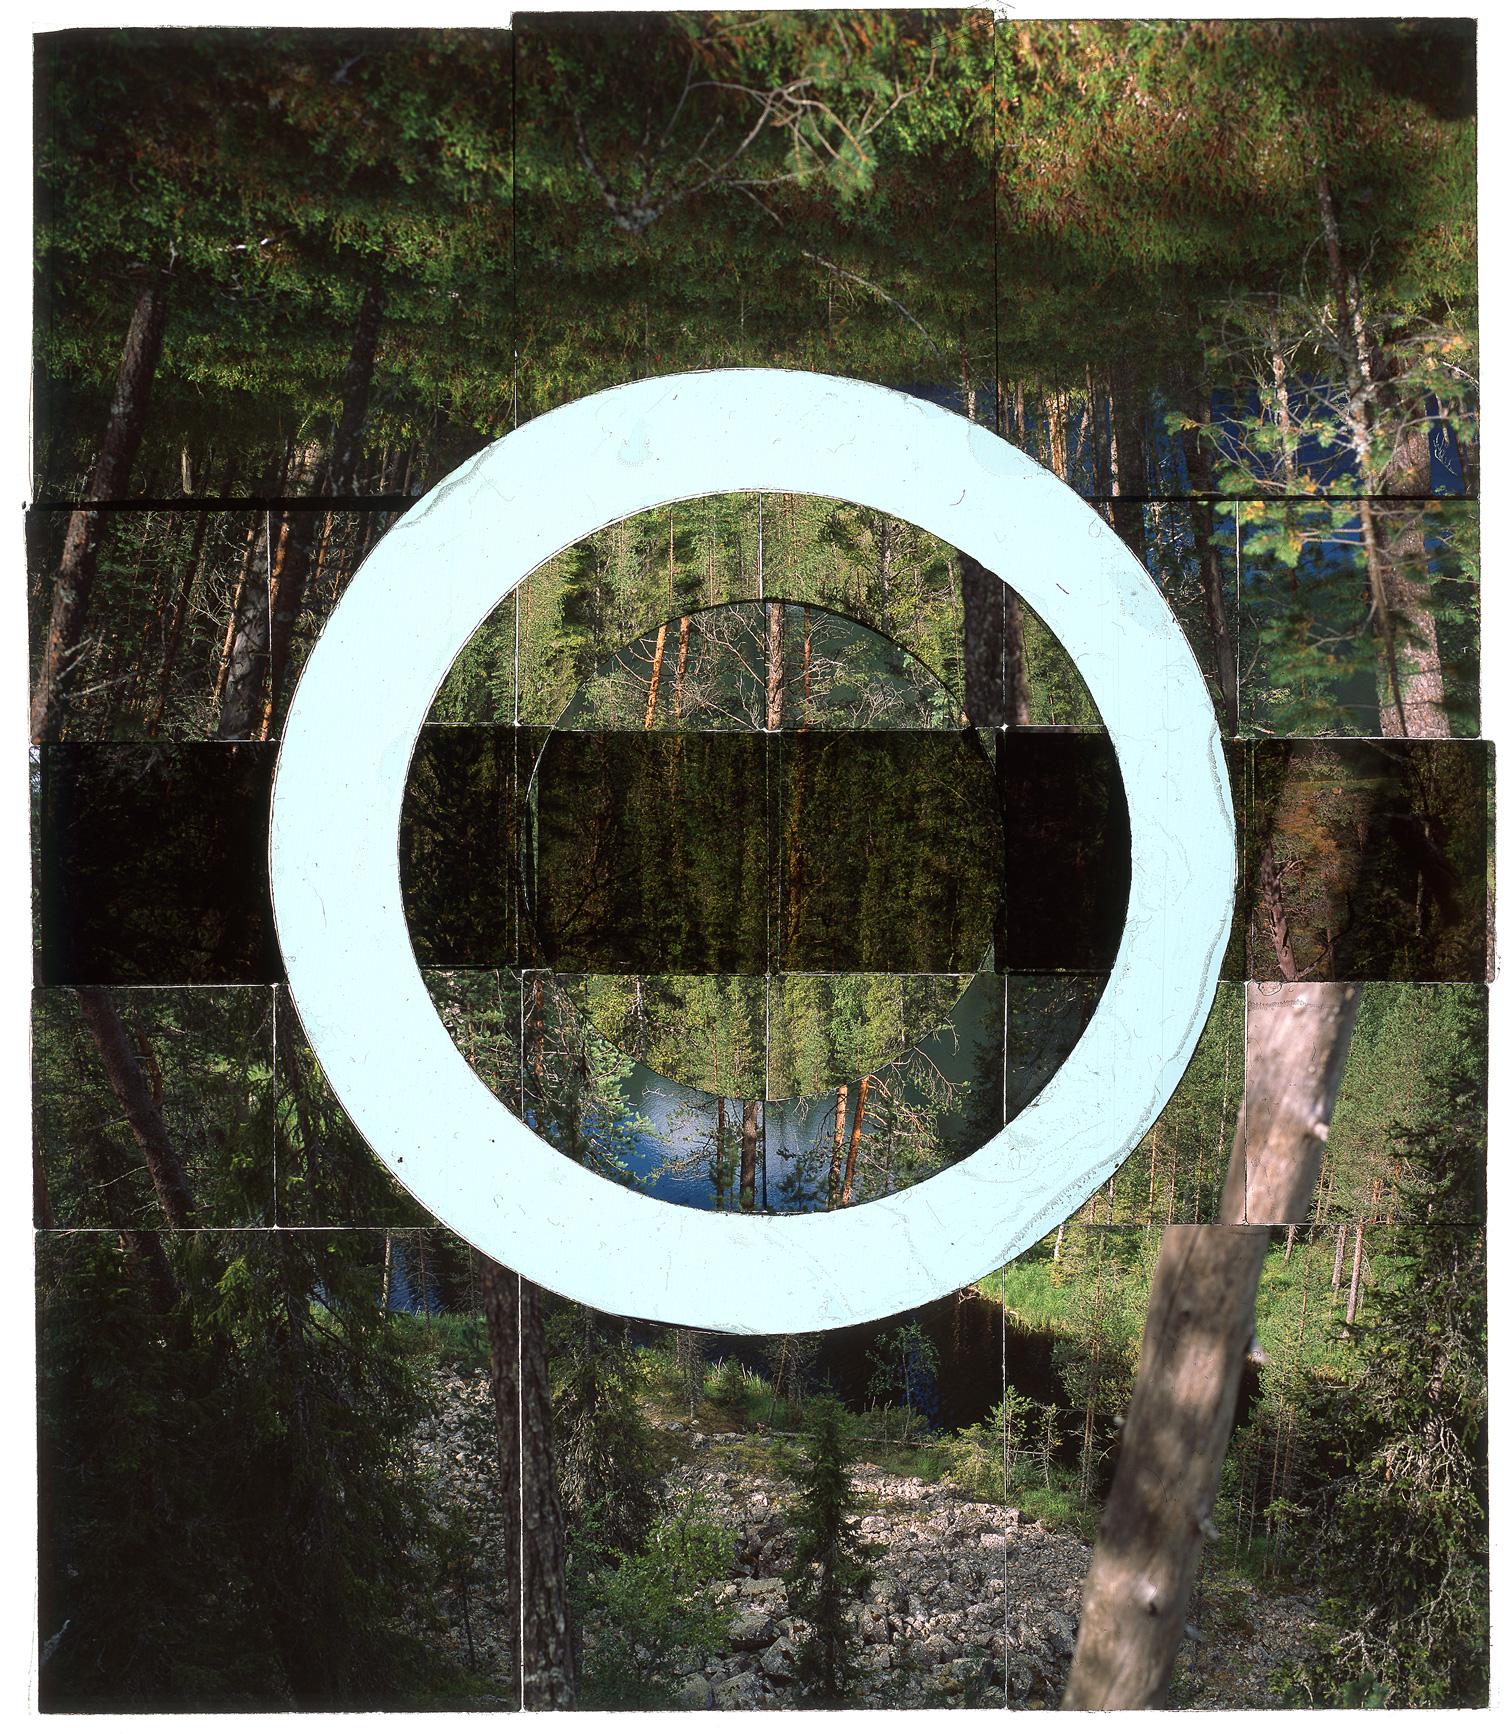 "ALA-ÖLKKY, FINLAND - 30""x36"" (76cmx91cm) • TRANSPARENCY FILM PRINT, ARCHIVAL PIGMENT ON FUJI LUSTRE  (EDITION OF 5)"